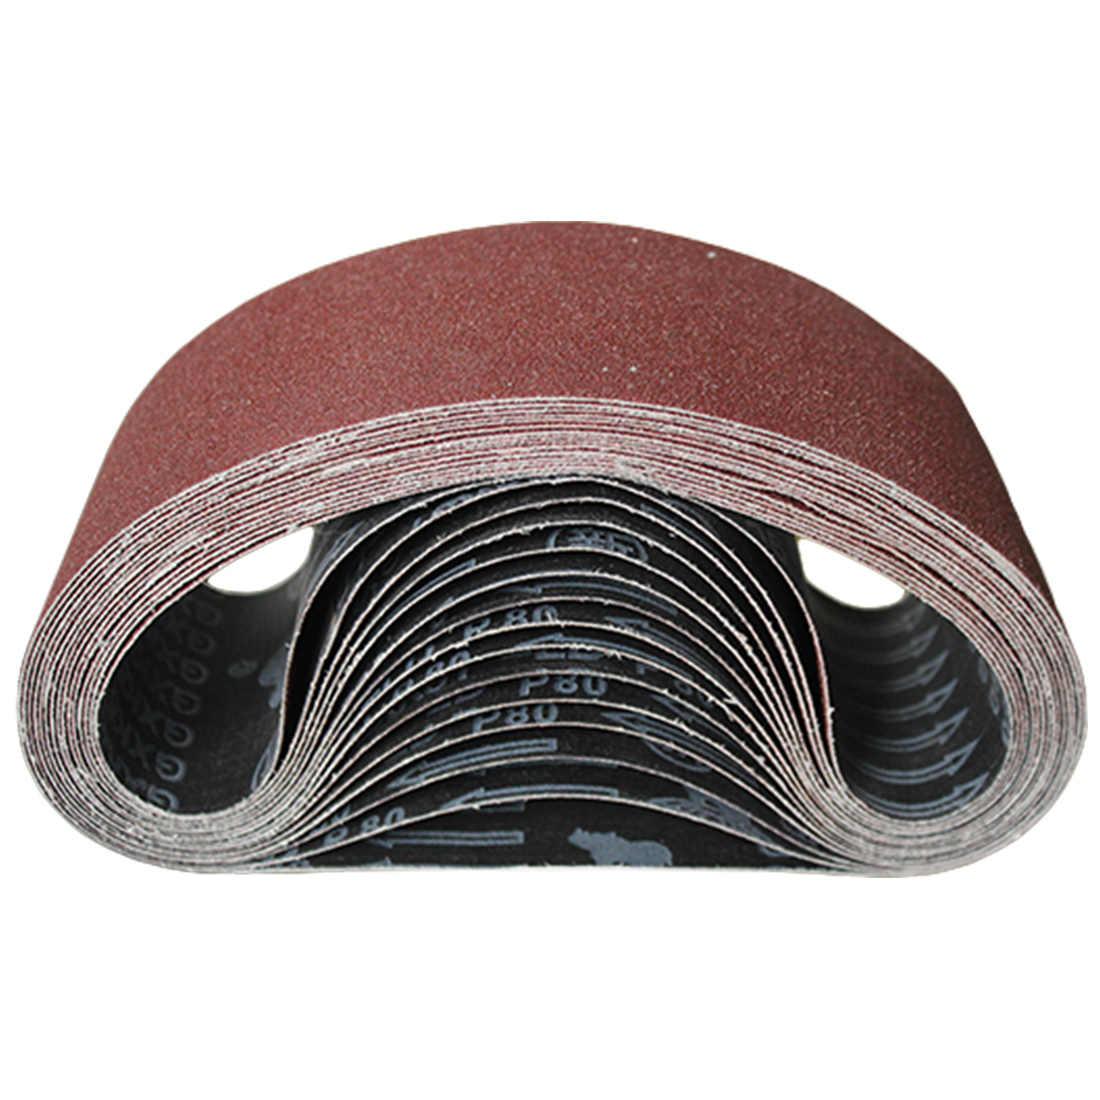 Sanding Belts 60 600 Grits Sandpaper Abrasive Bands For Sander Power Rotary Tools Dremel Accessories Abrasive Tool Abrasives Aliexpress